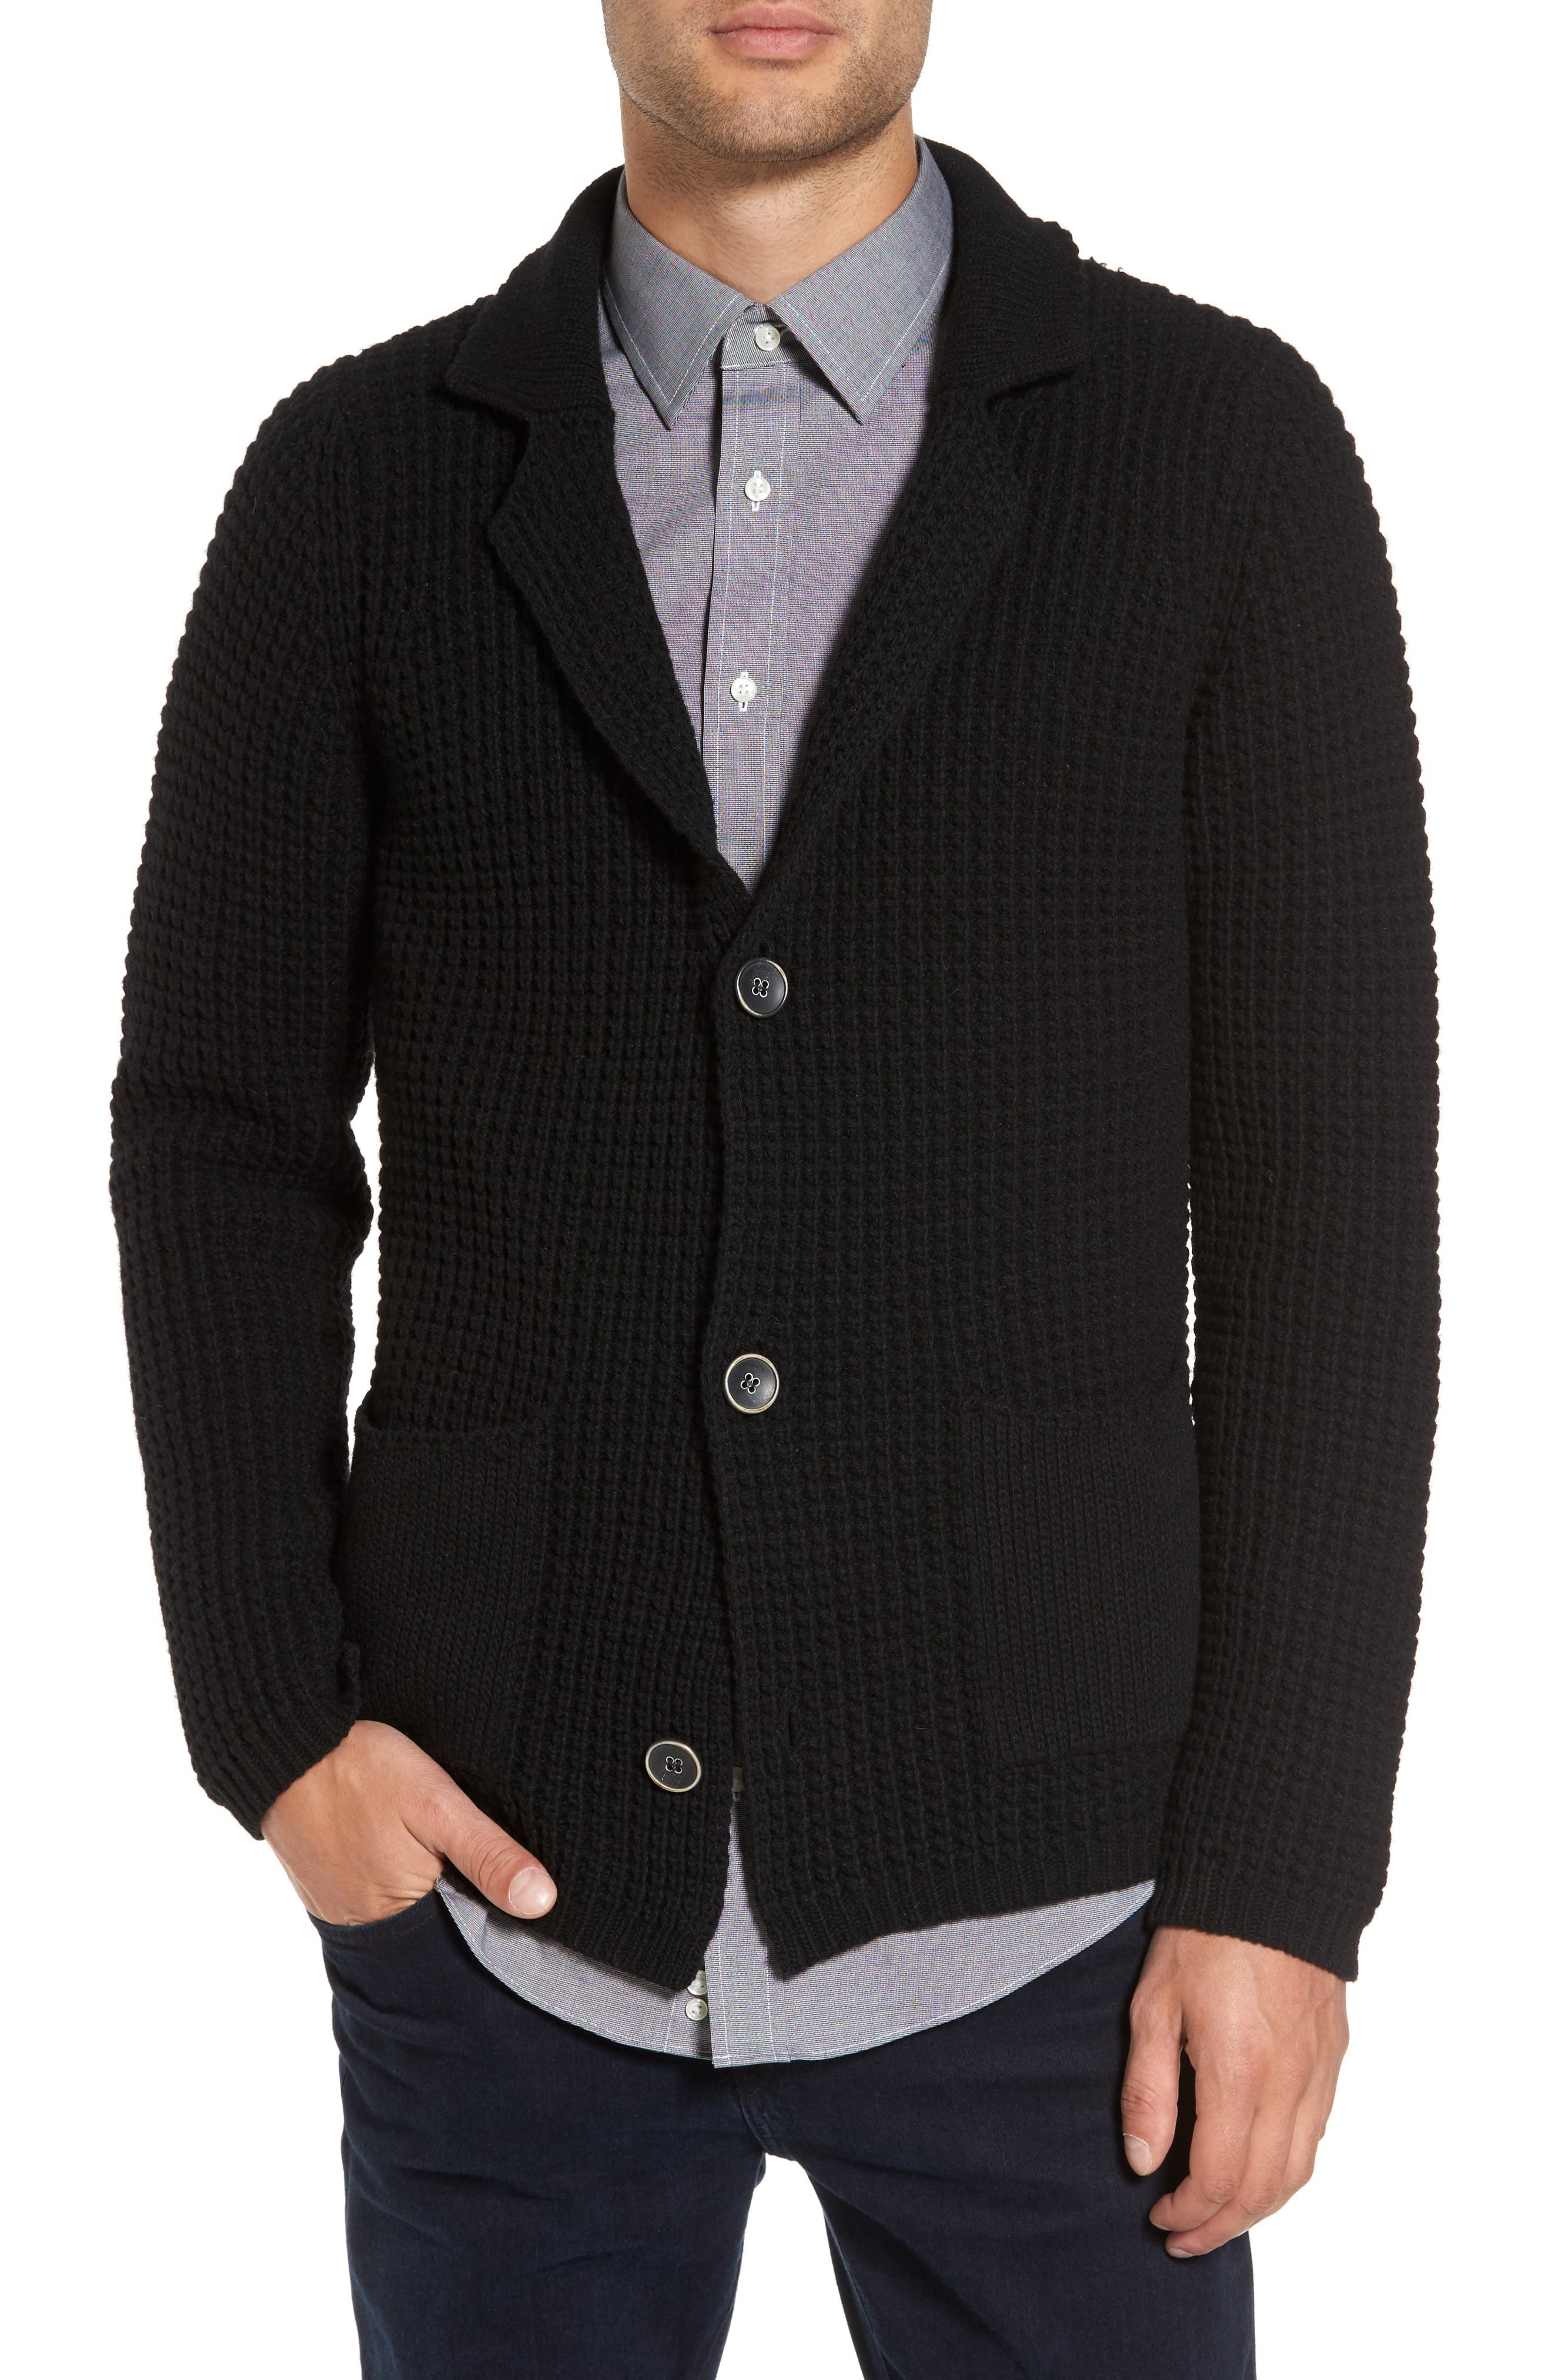 Main Image - Sand Trim Fit Knit Cardigan Jacket